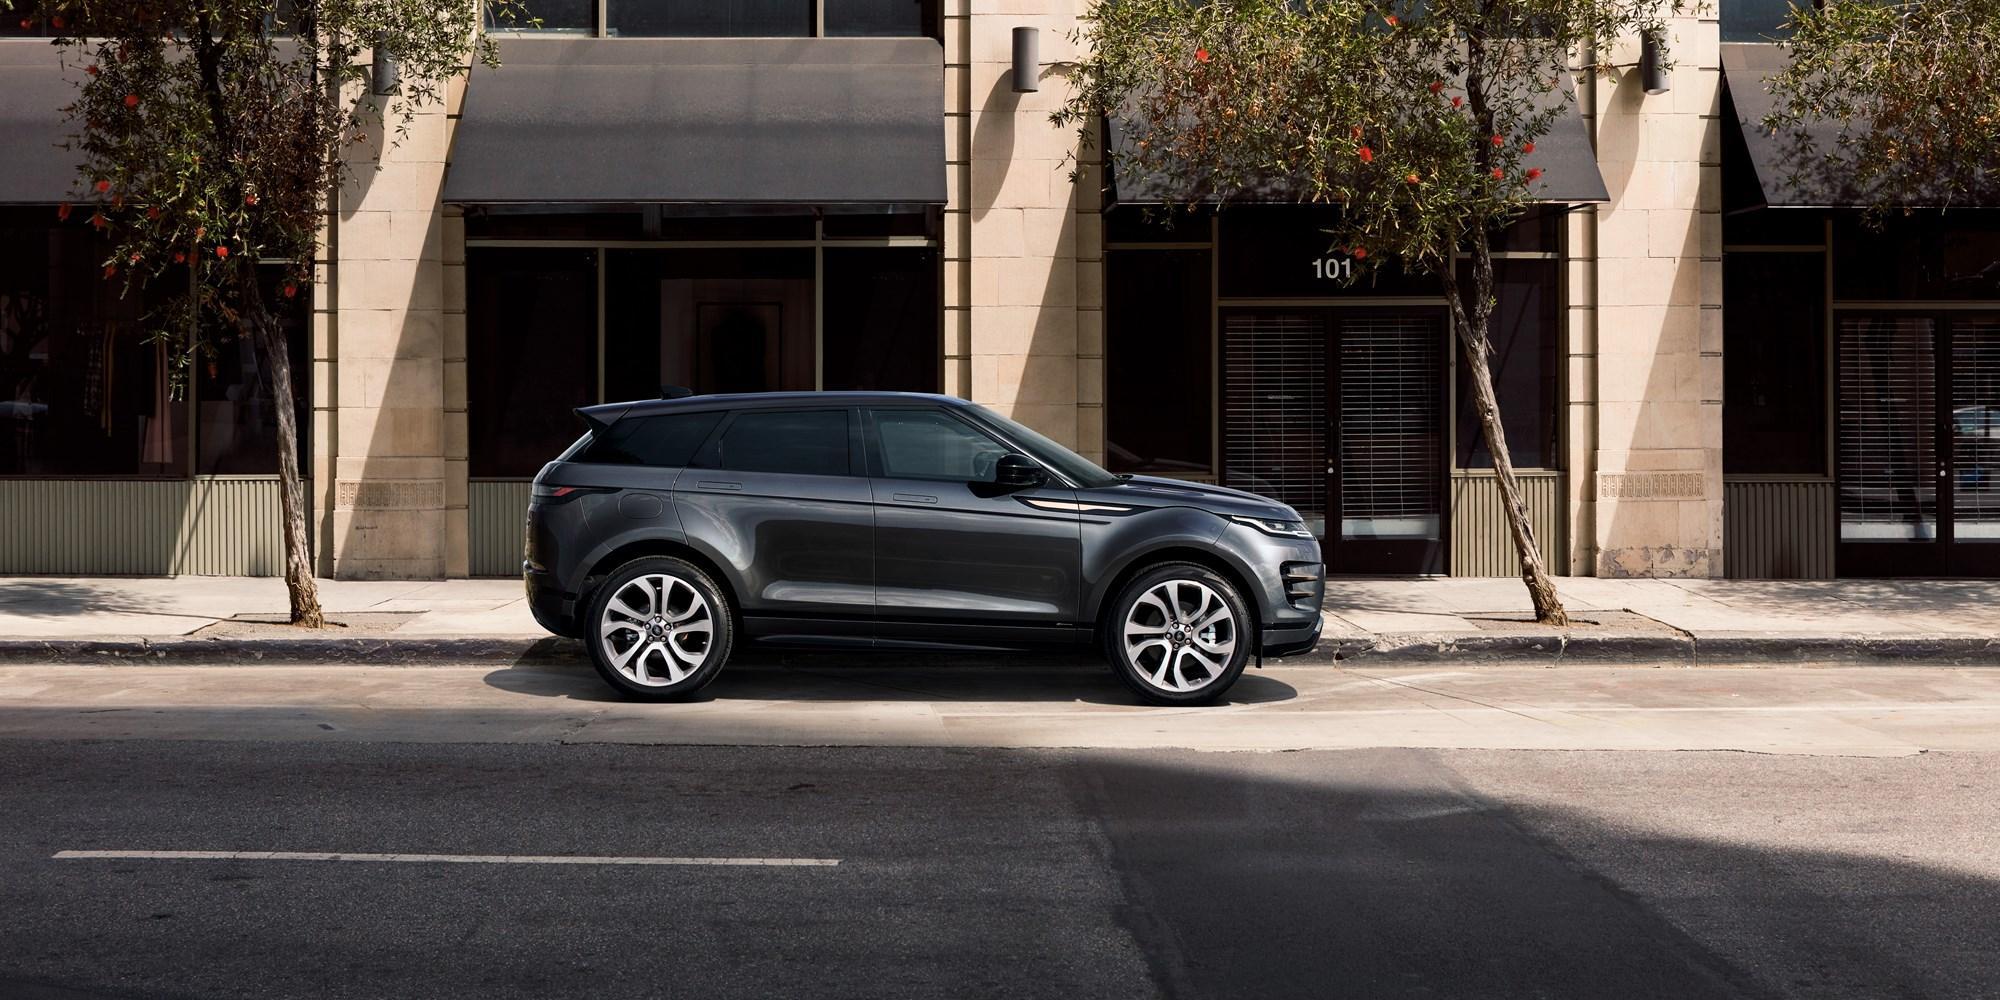 Range Rover Evoque PHEV